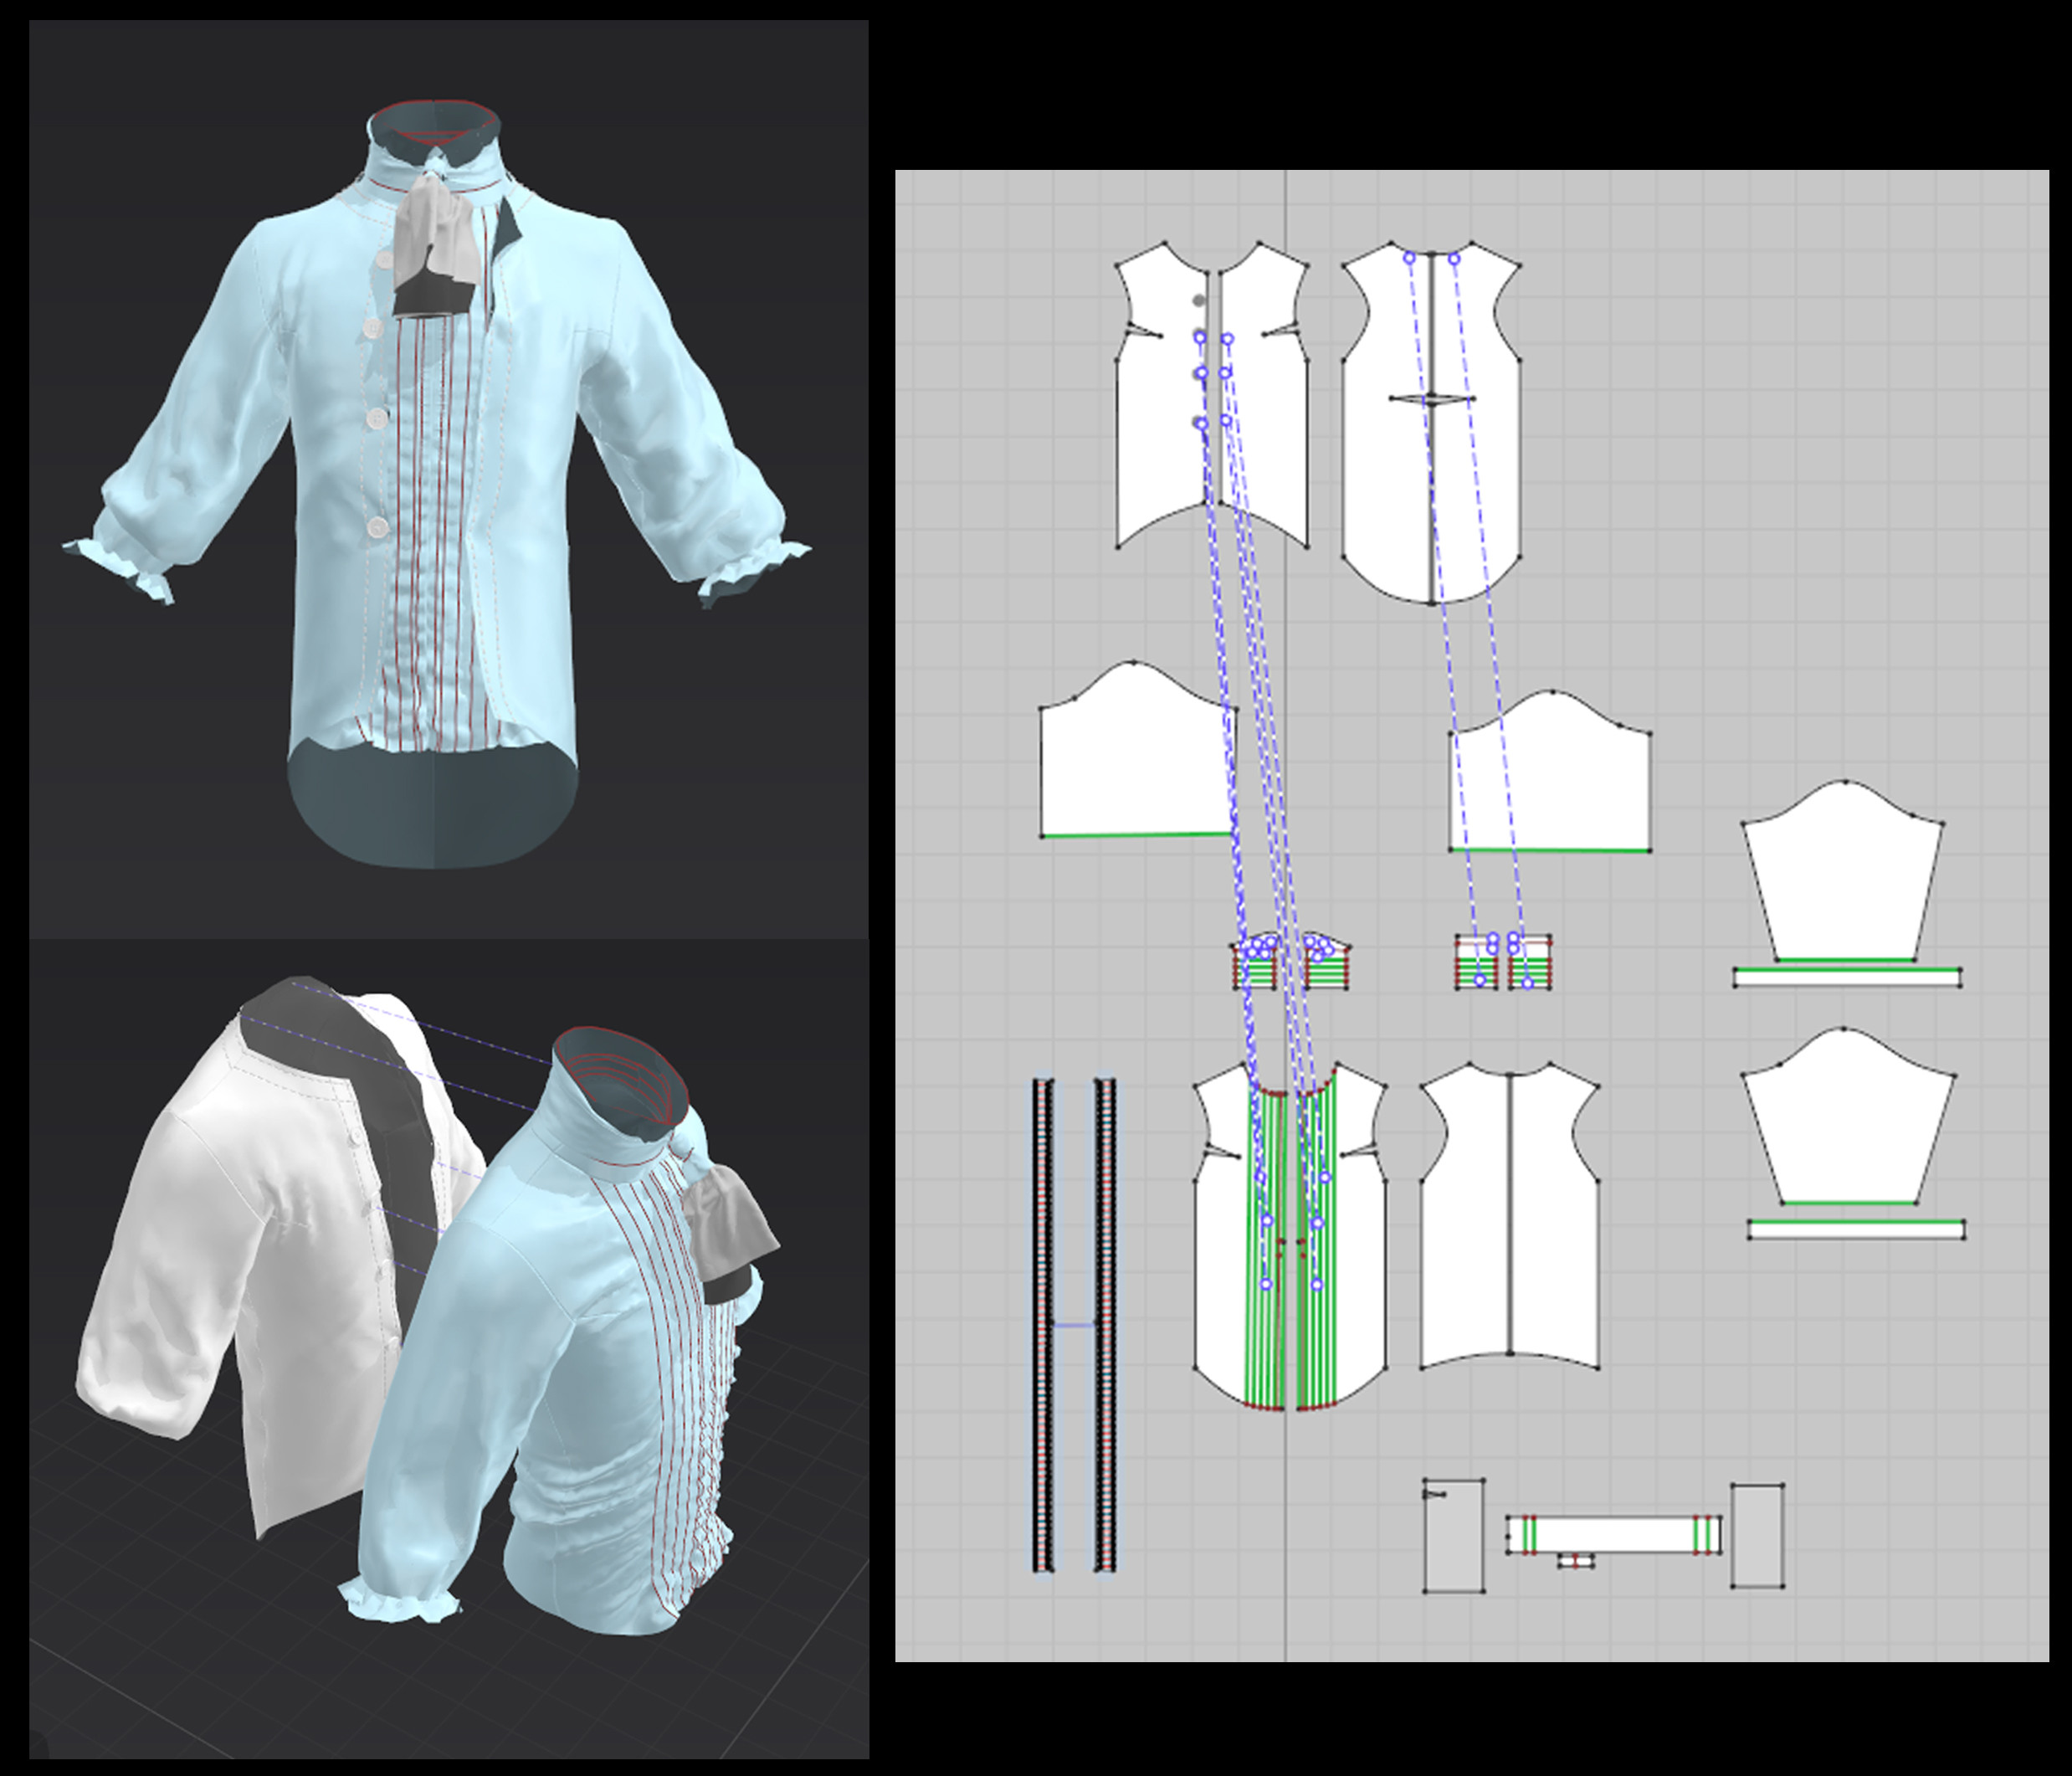 Marvelous designer process